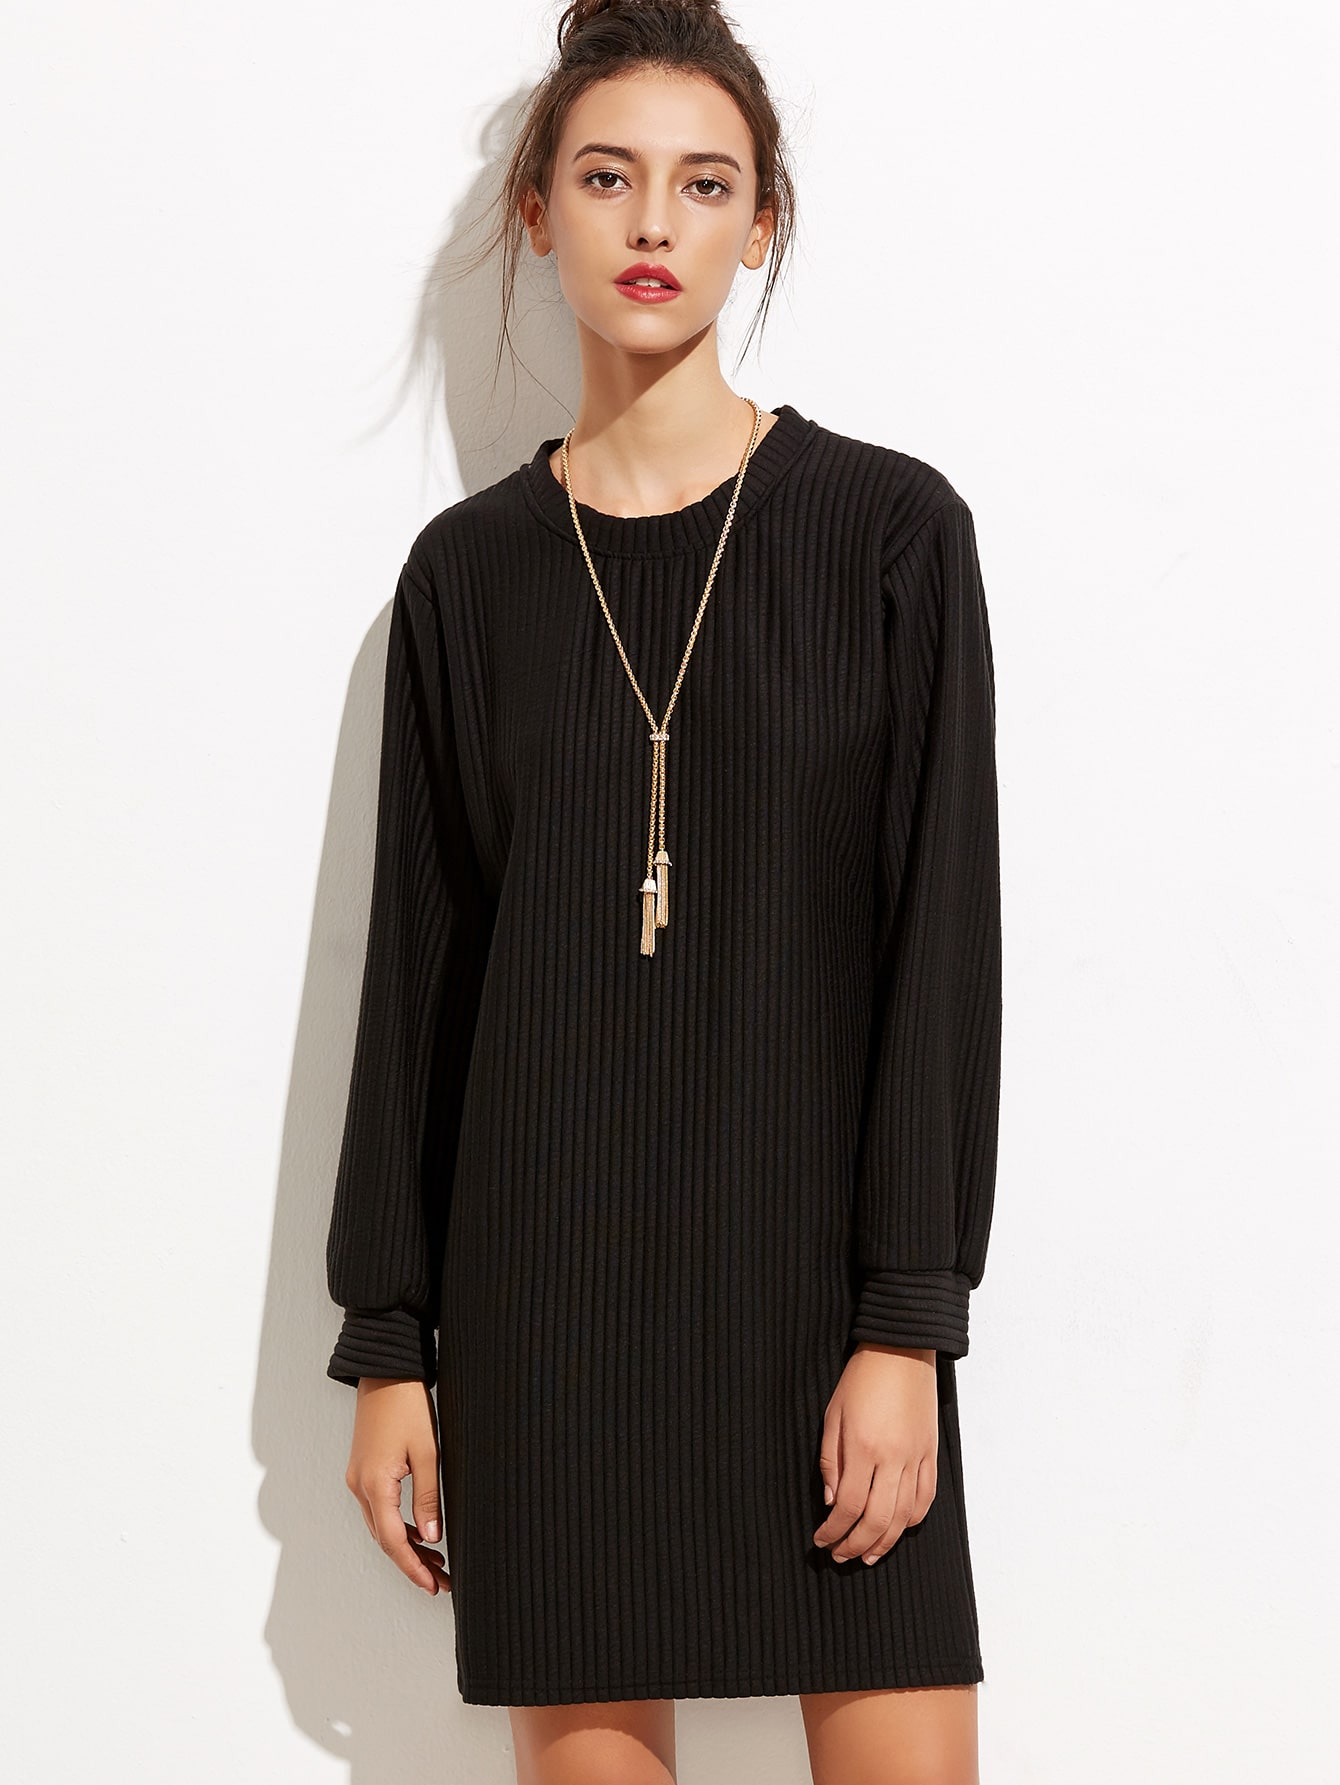 Black Ribbed Long Sleeve Tunic Dress dress160919104